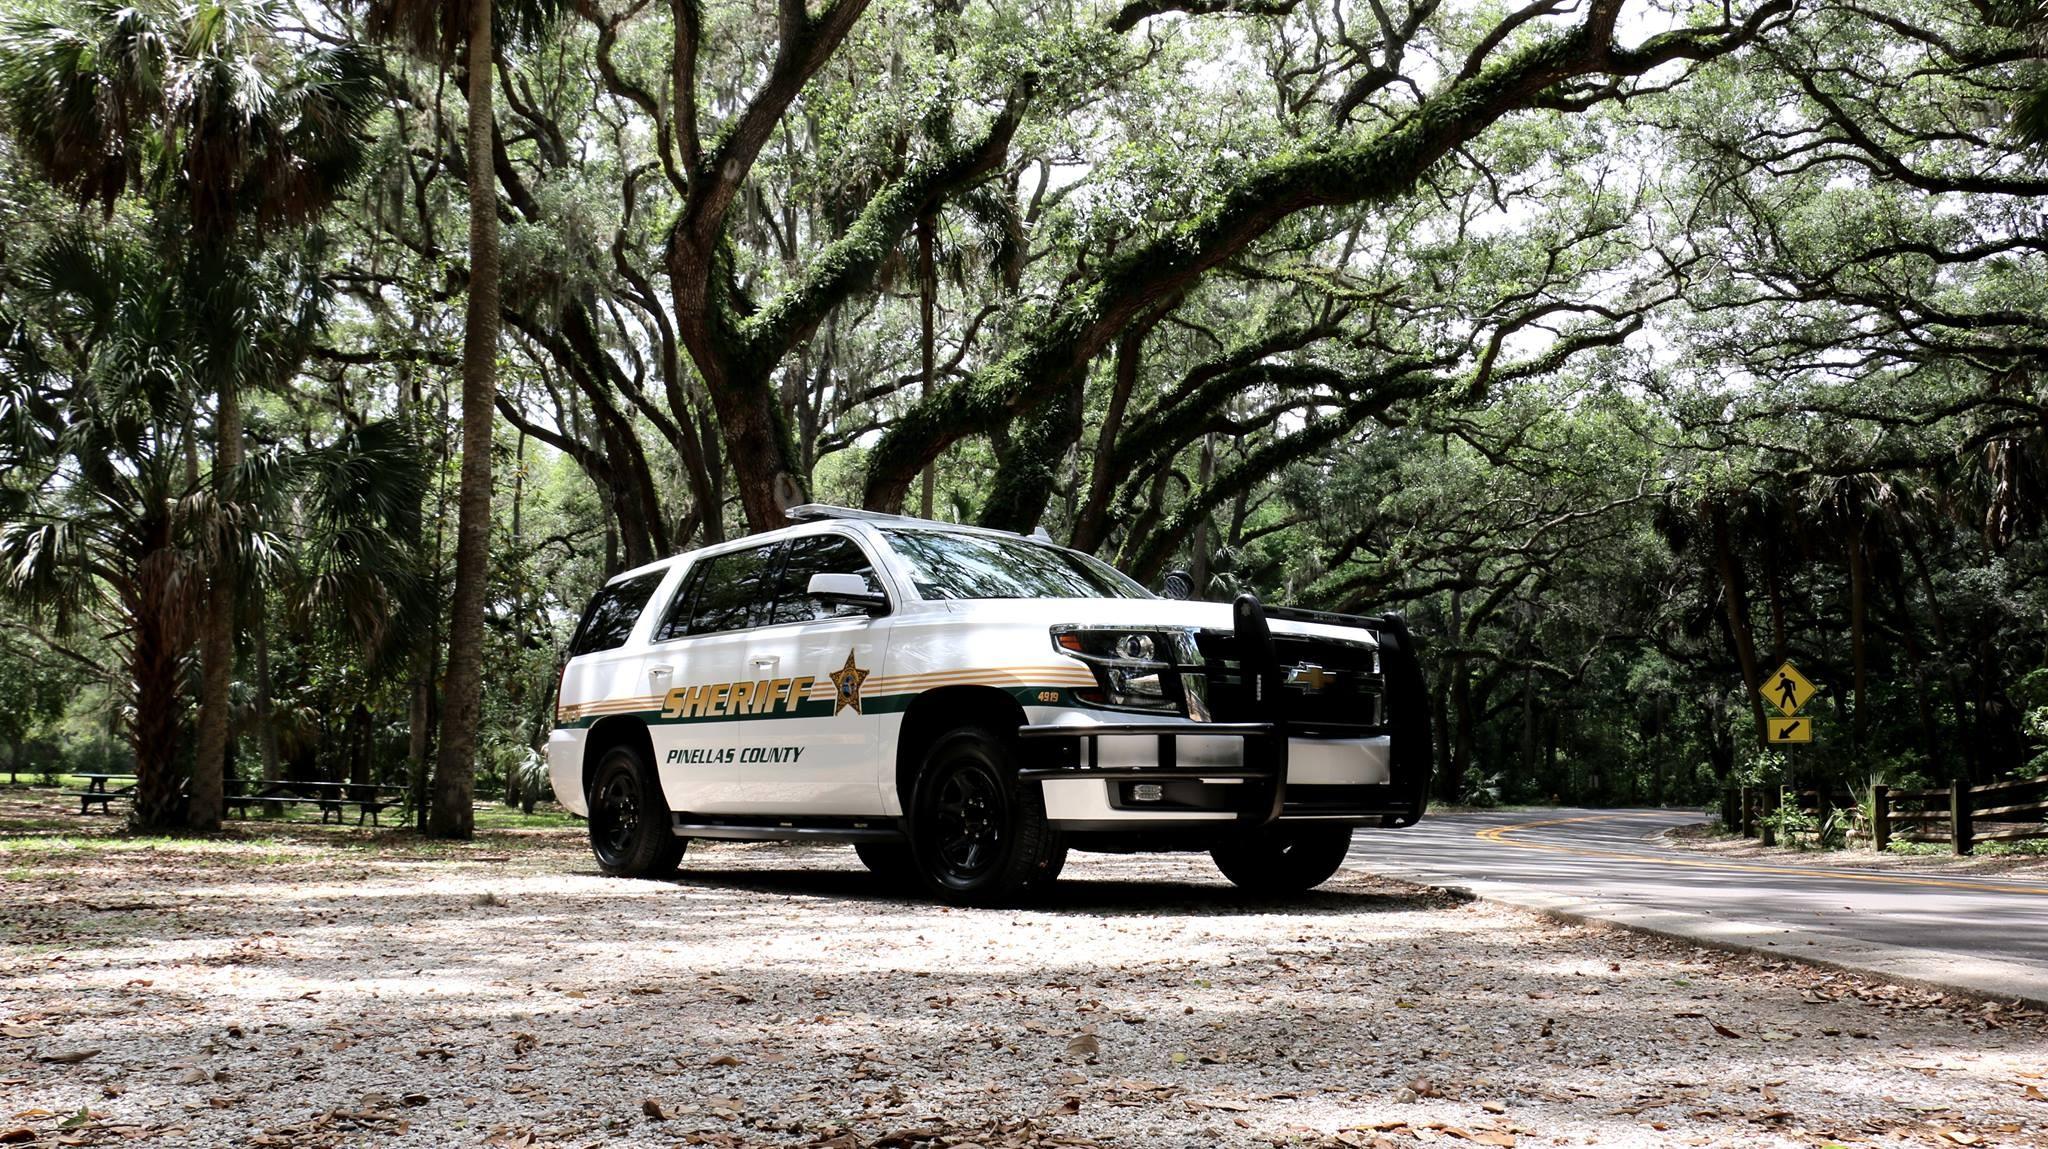 Pinellas County Sheriff's Office | LinkedIn